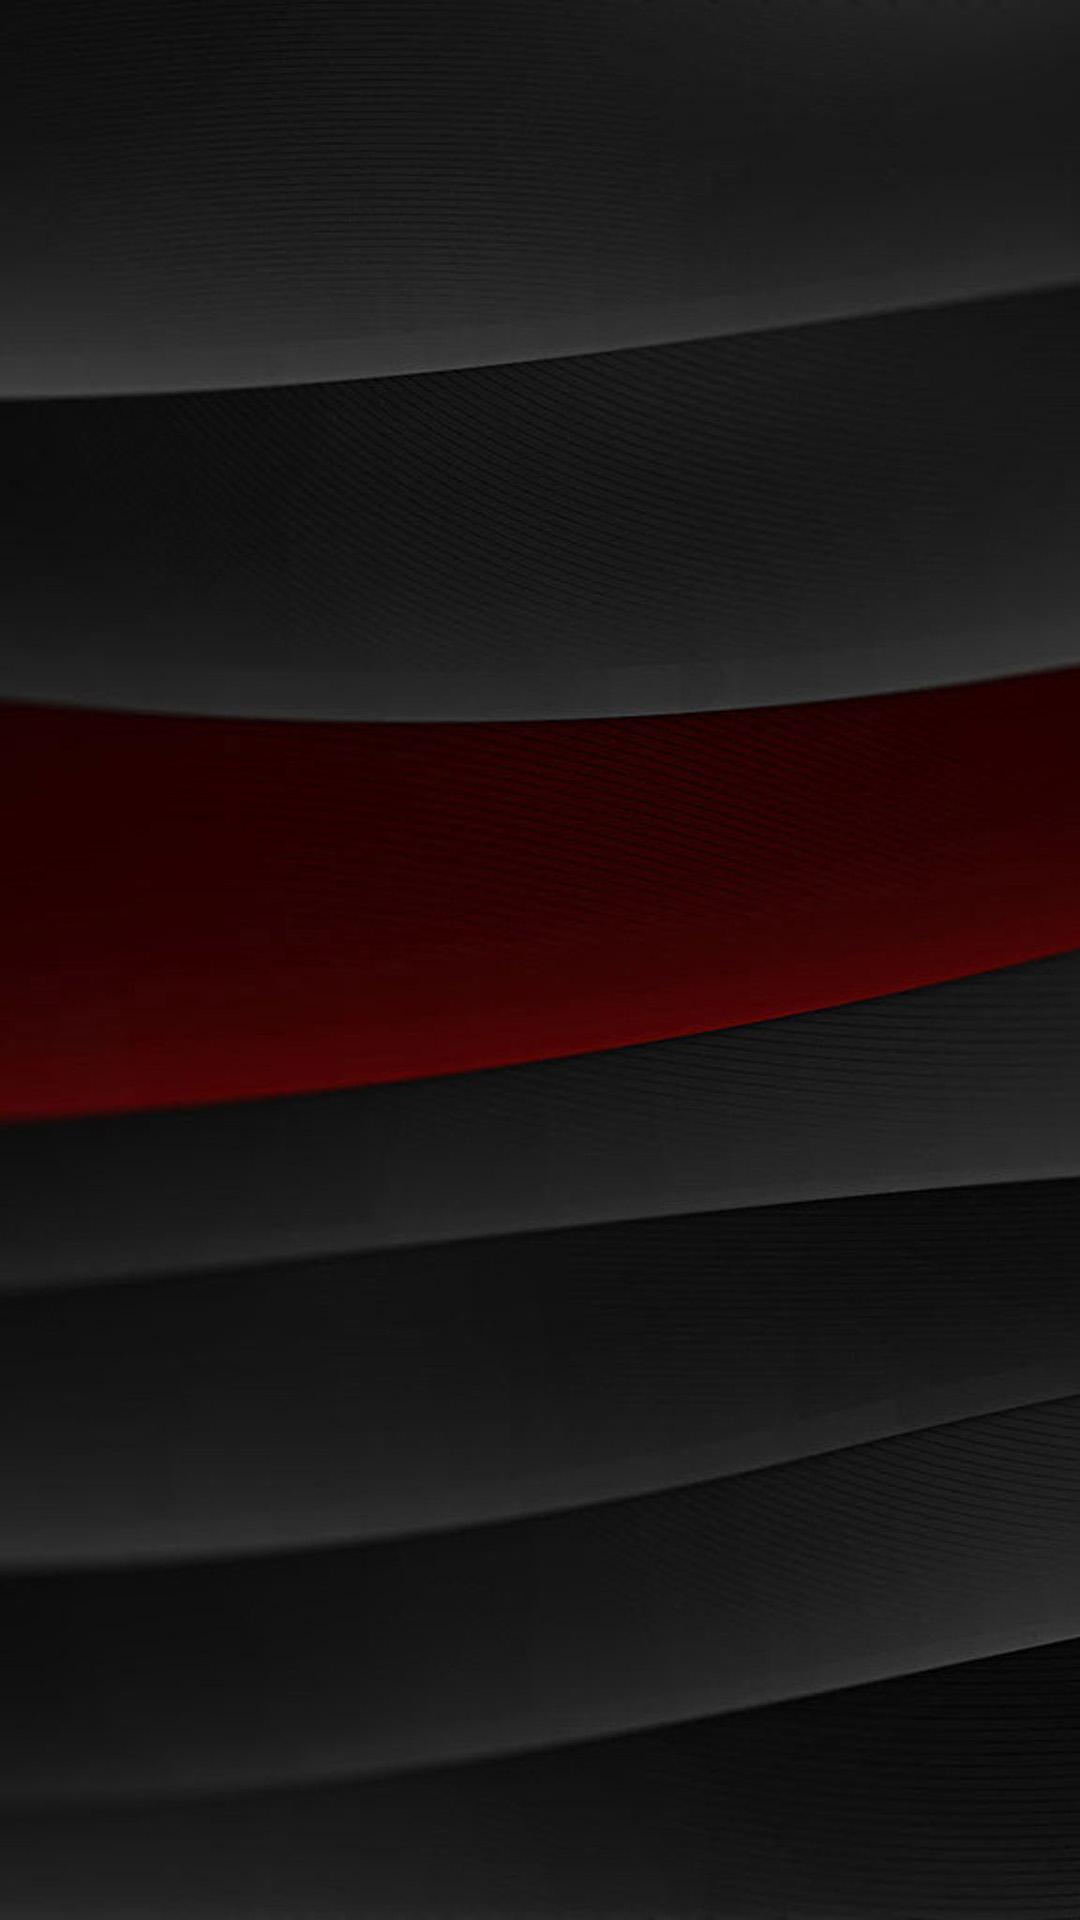 Texture Samsung Galaxy S5 Wallpapers   Part 11 1080x1920